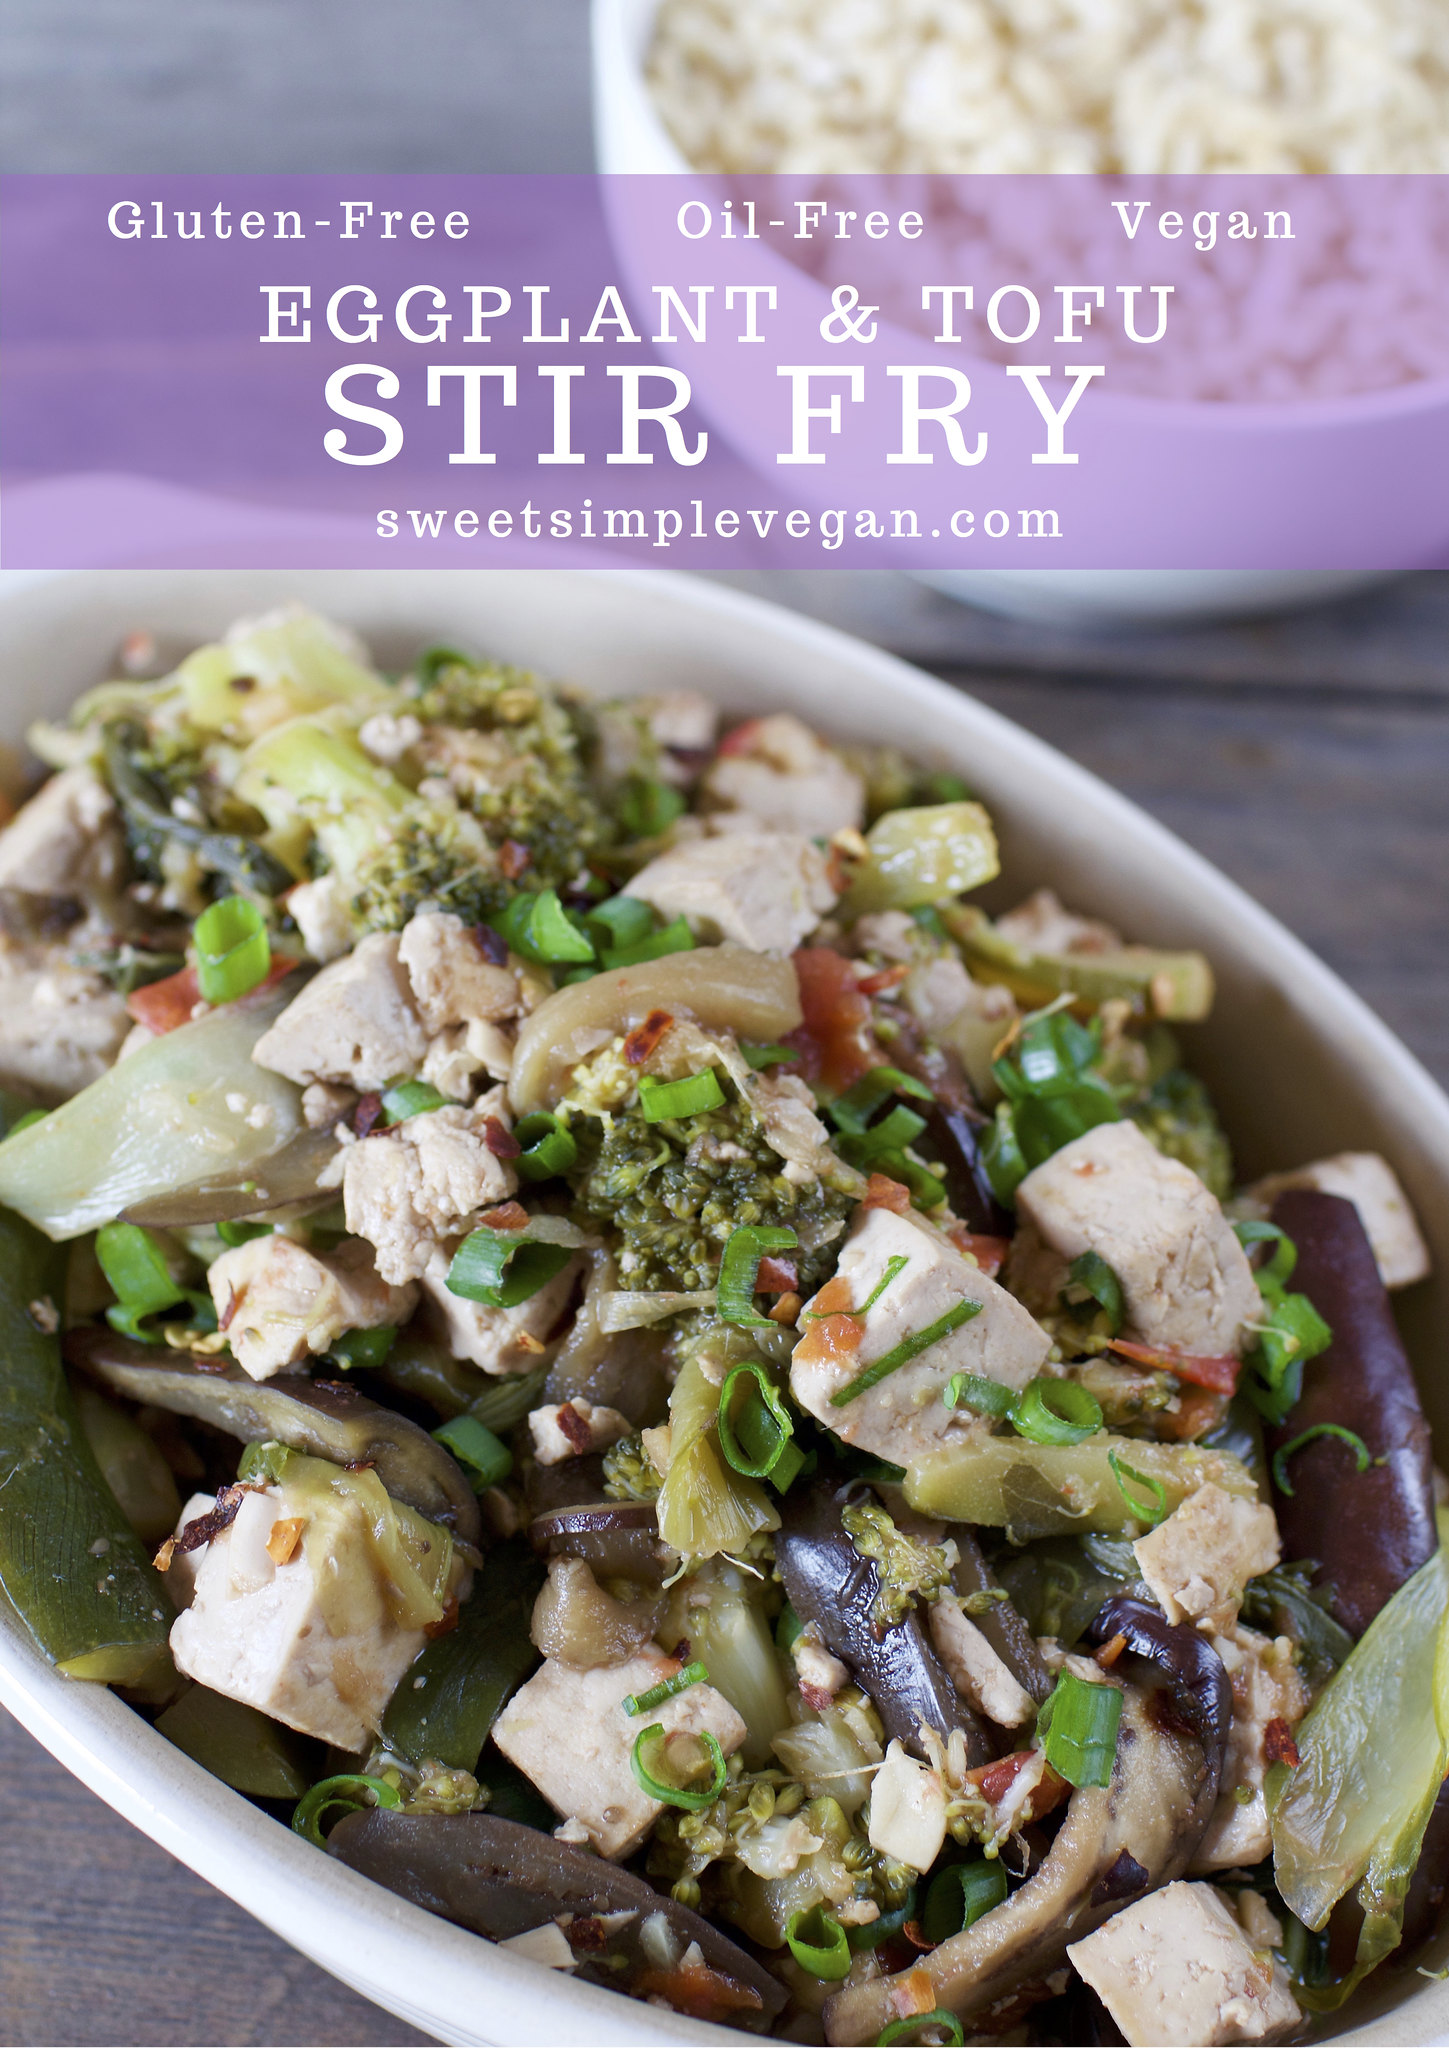 Eggplant & Tofu Stir Fry {Hclf Oil & Gluten-Free} sweetsimplevegan.com